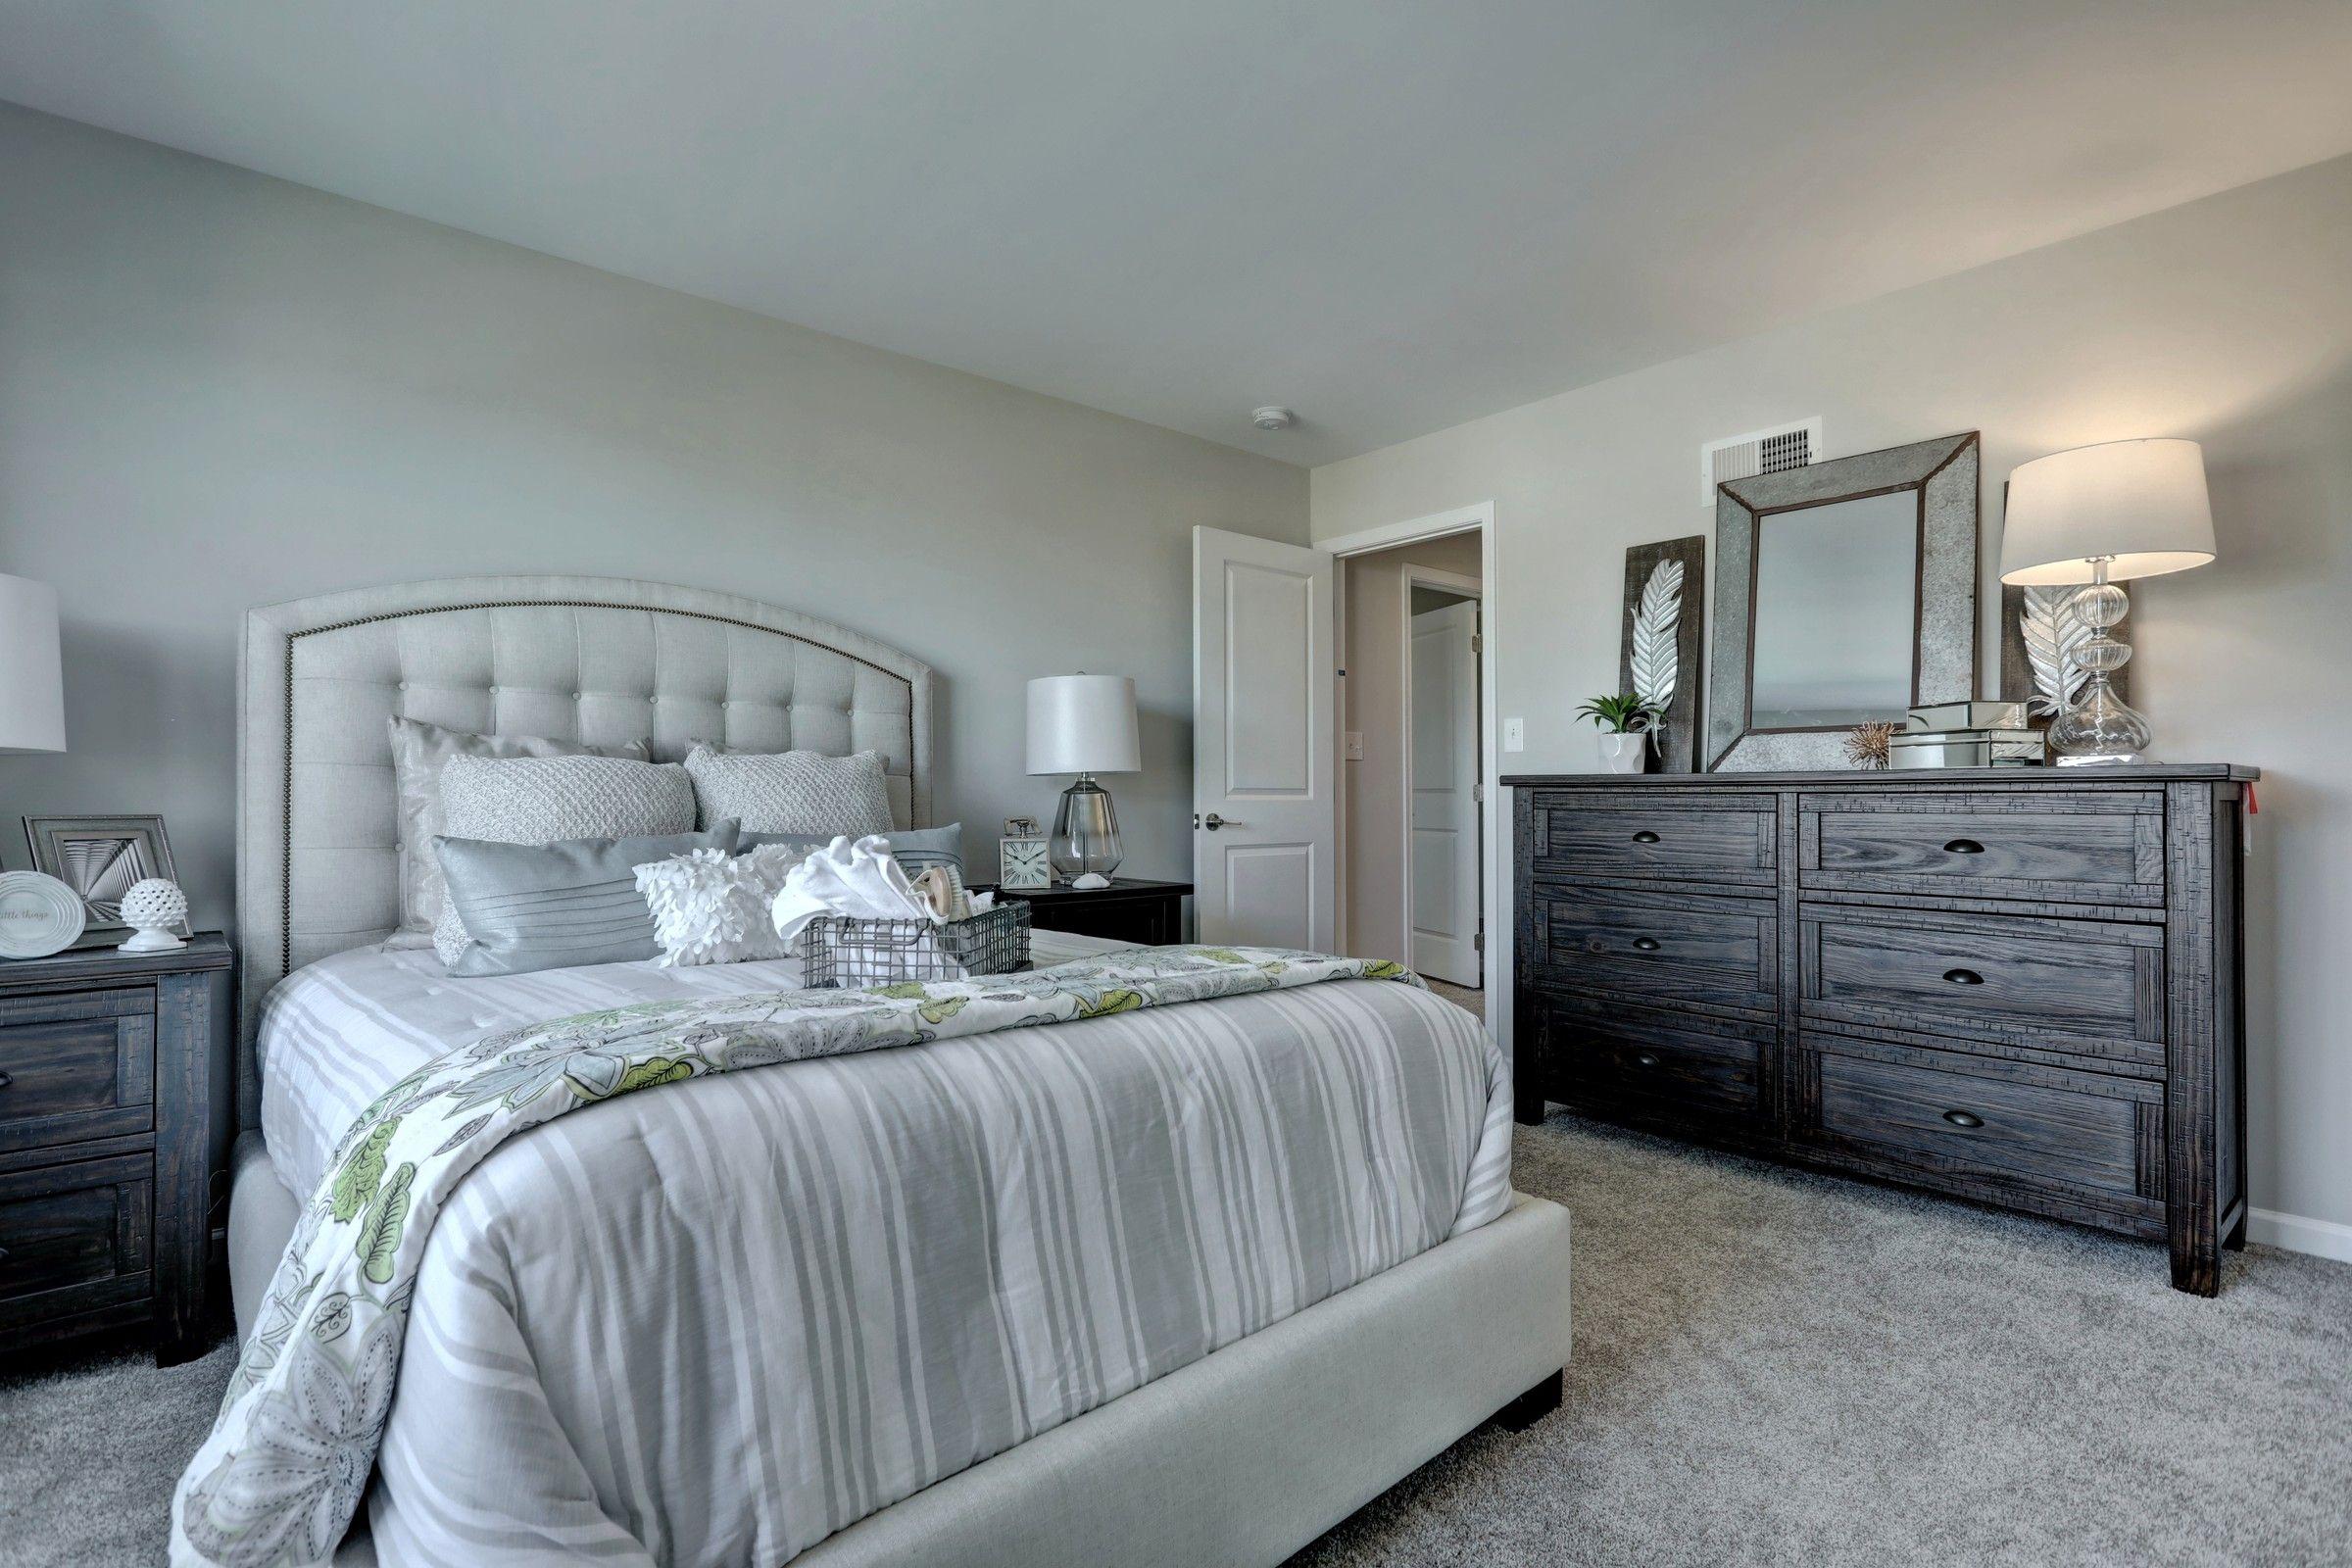 Bedroom featured in the Parker Bordeaux By Keystone Custom Homes in Philadelphia, PA